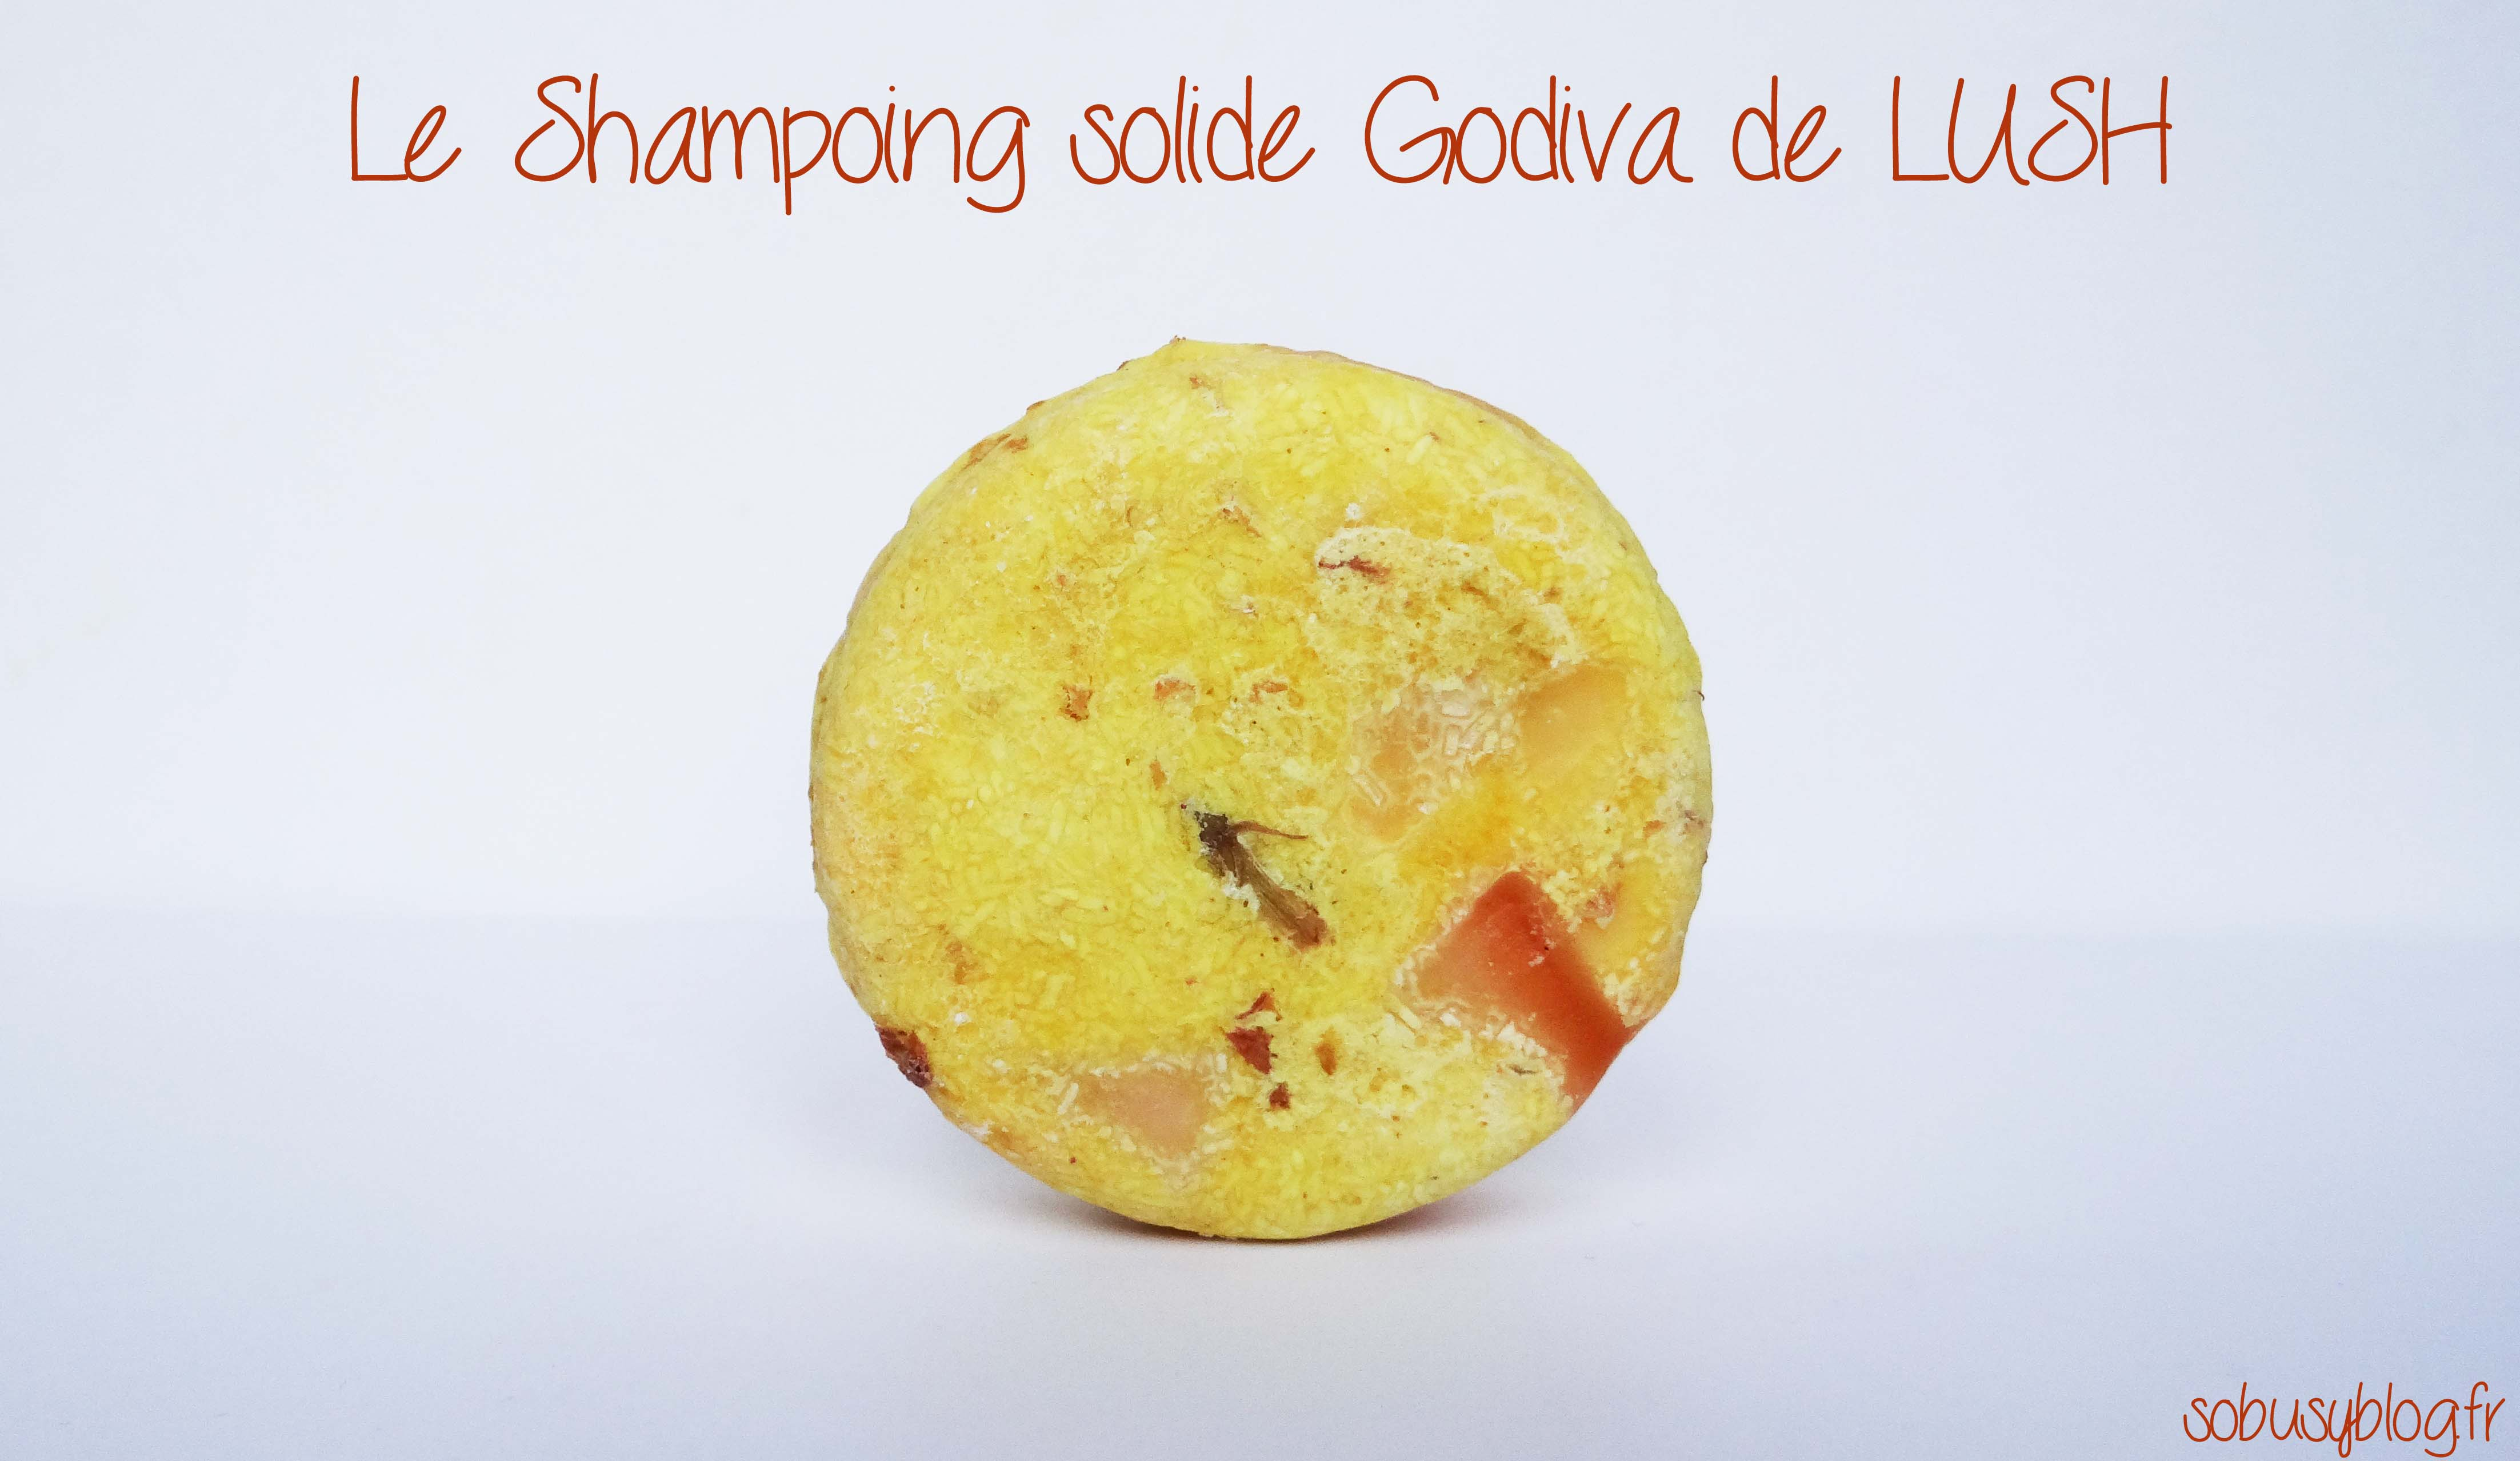 shampoing-solide-godiva-lush